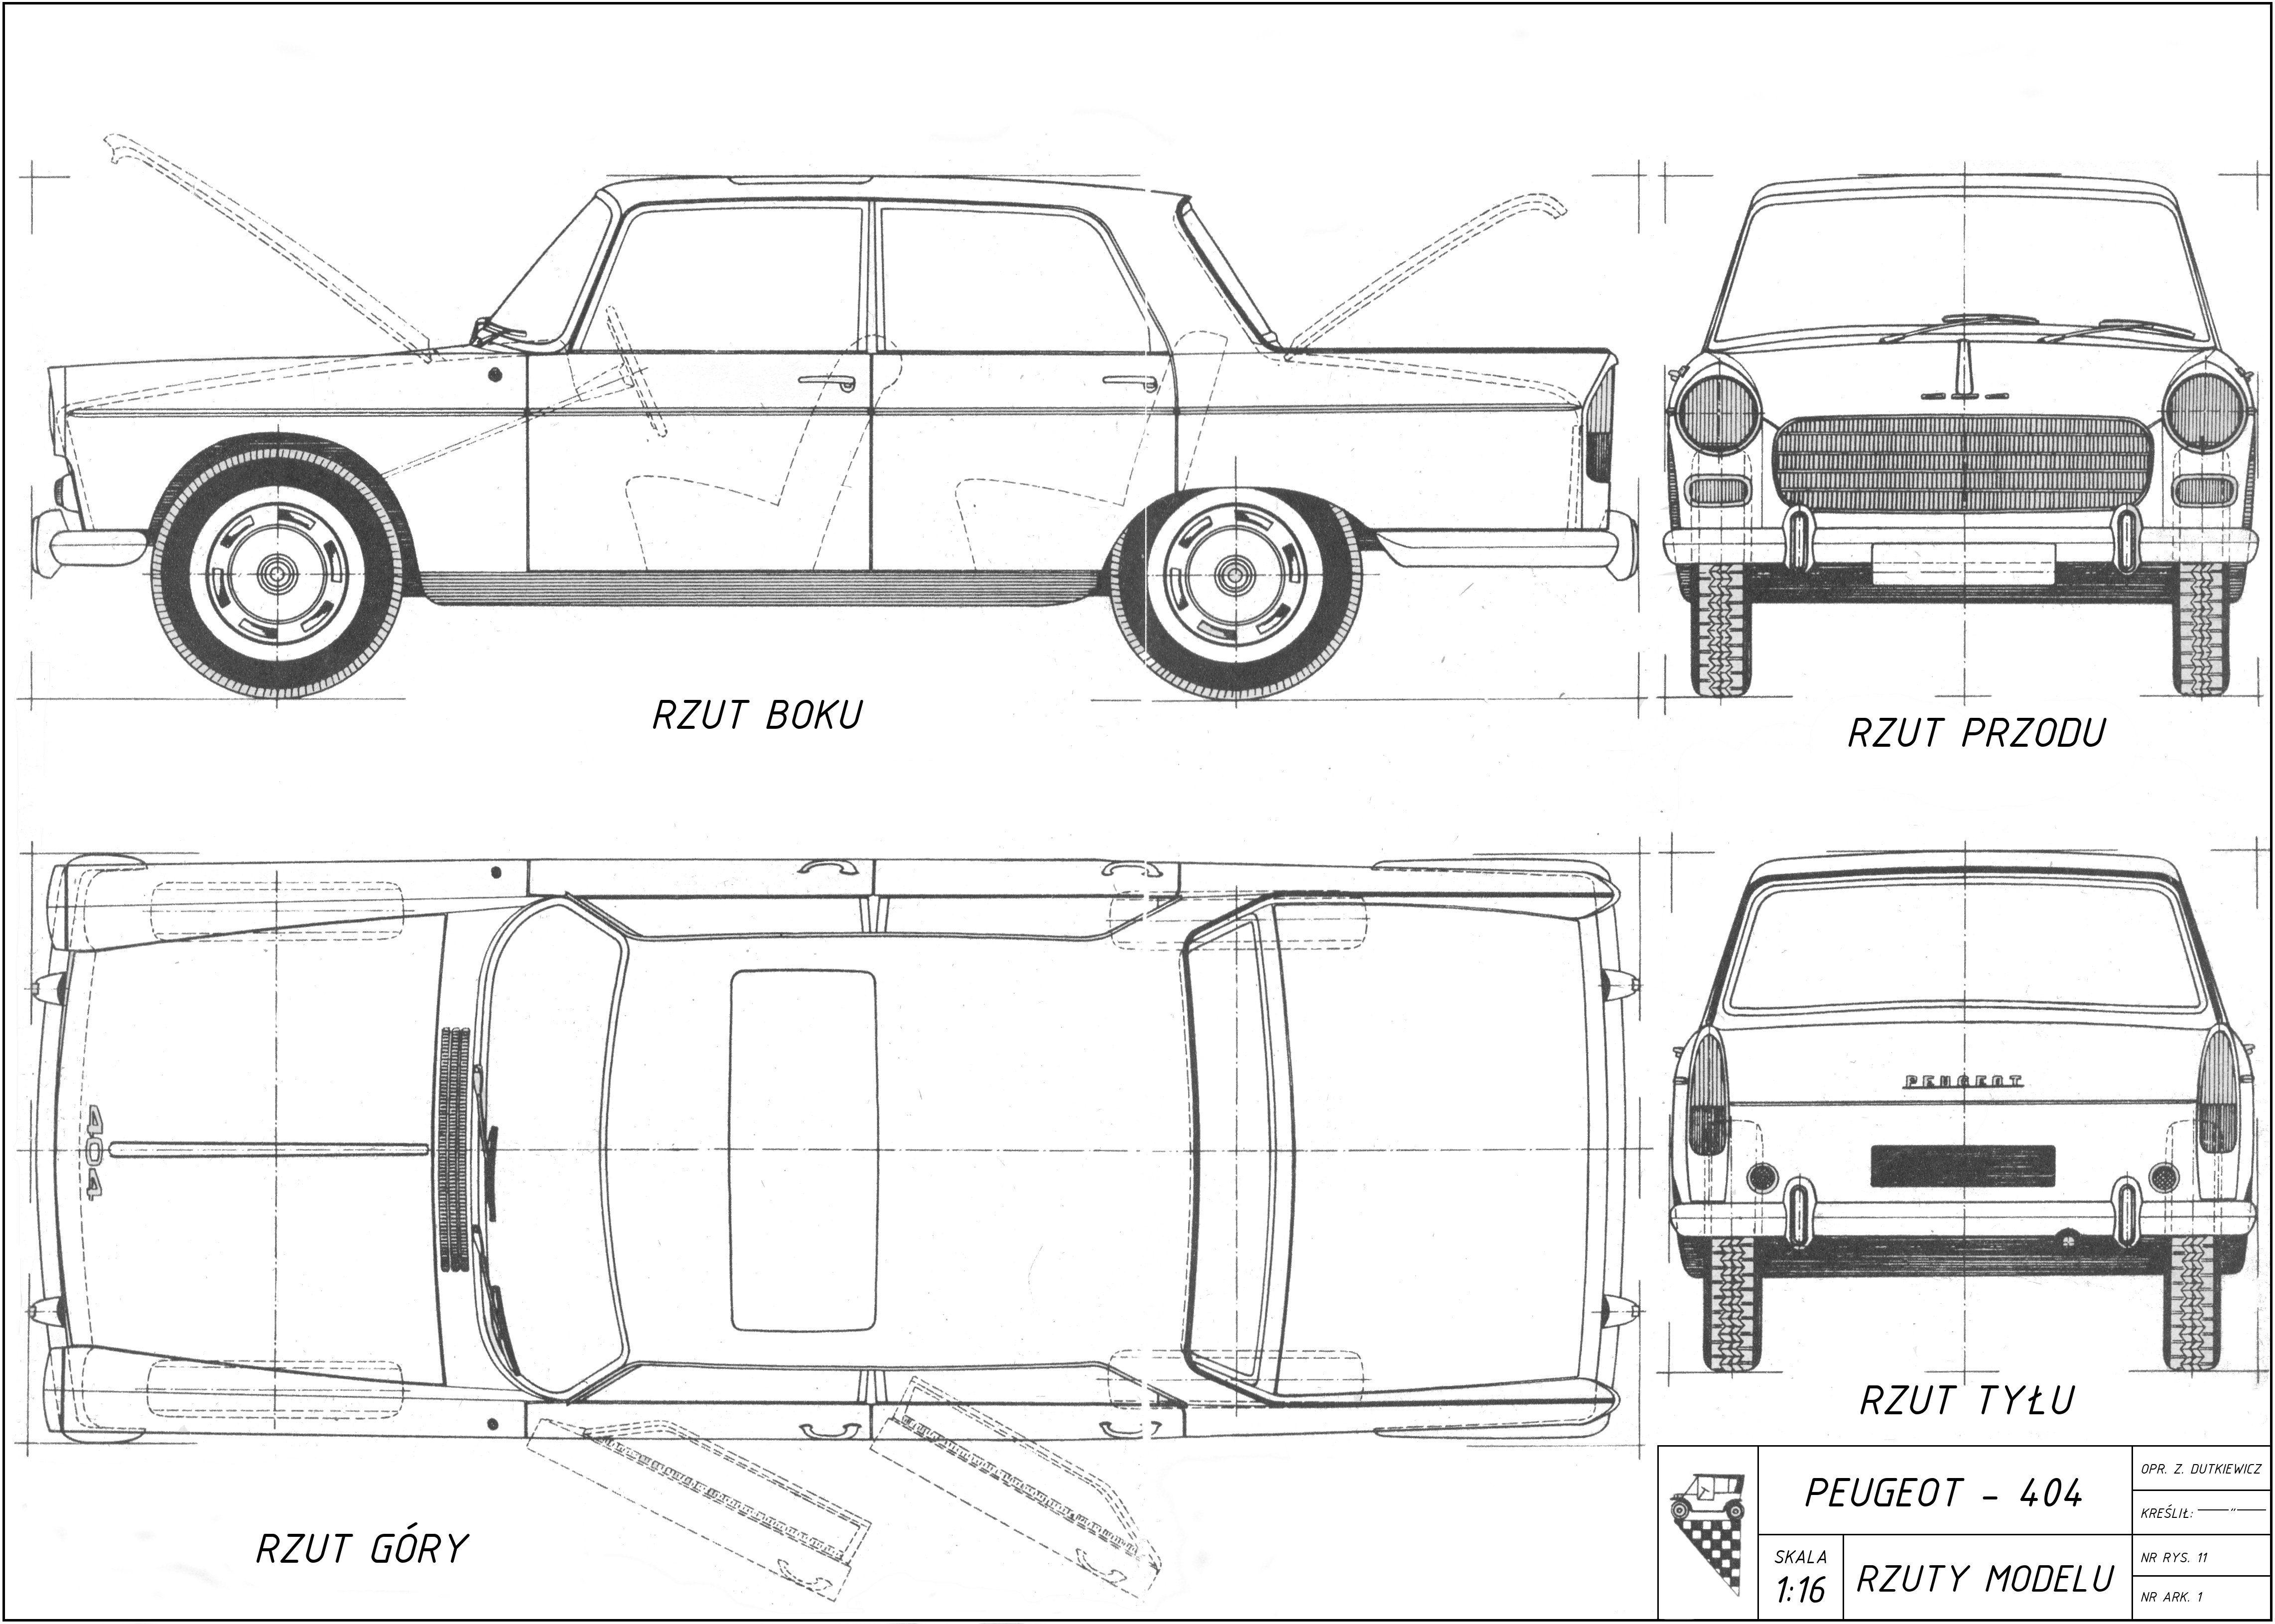 D Peugeot 404 Peugeot 404 02